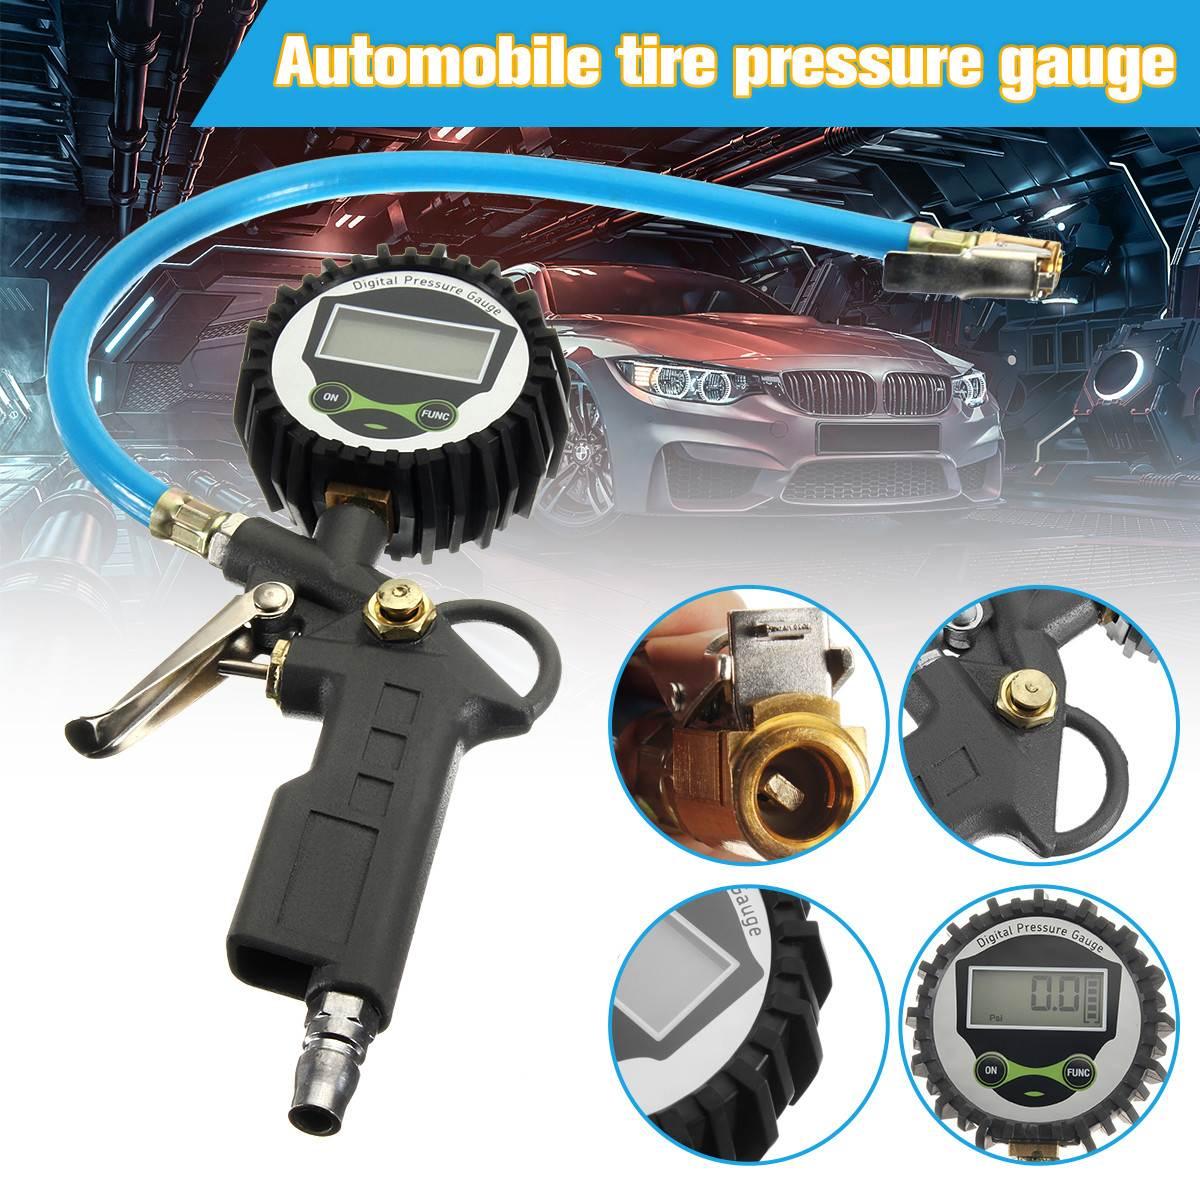 ZEAST Car Vehicle Digital Air Tire Pressure Truck LCD Inflator Gauge Dial Meter Tester Manometer Measuring Instruments